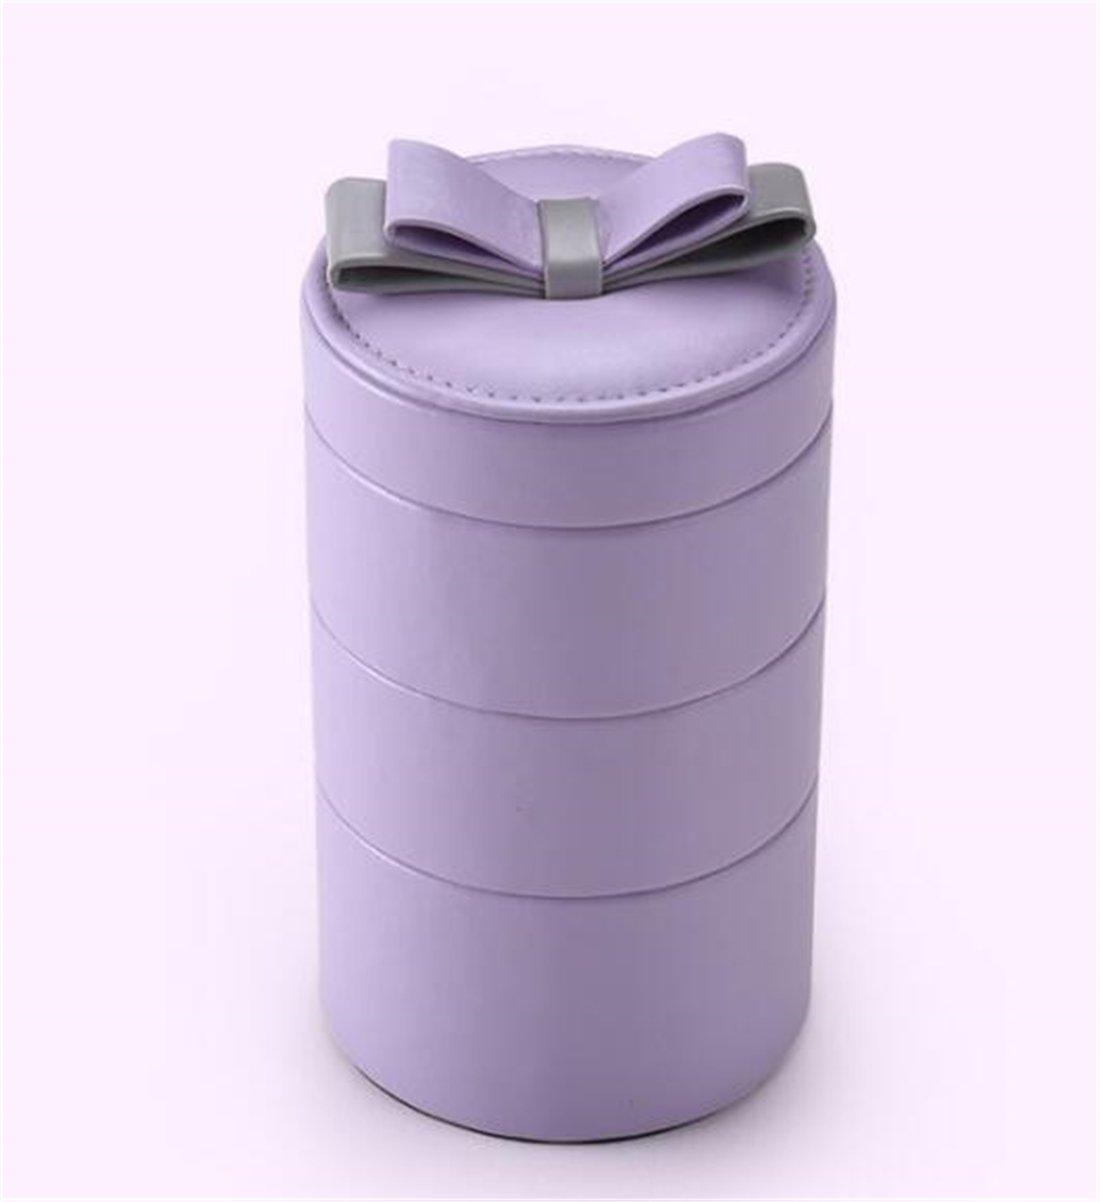 Tmrow 1pc Jewelry Box Organizer Mirrored Travel Jewelry Storage Case Gift for Women Teen Girls in Purple by Tmrow